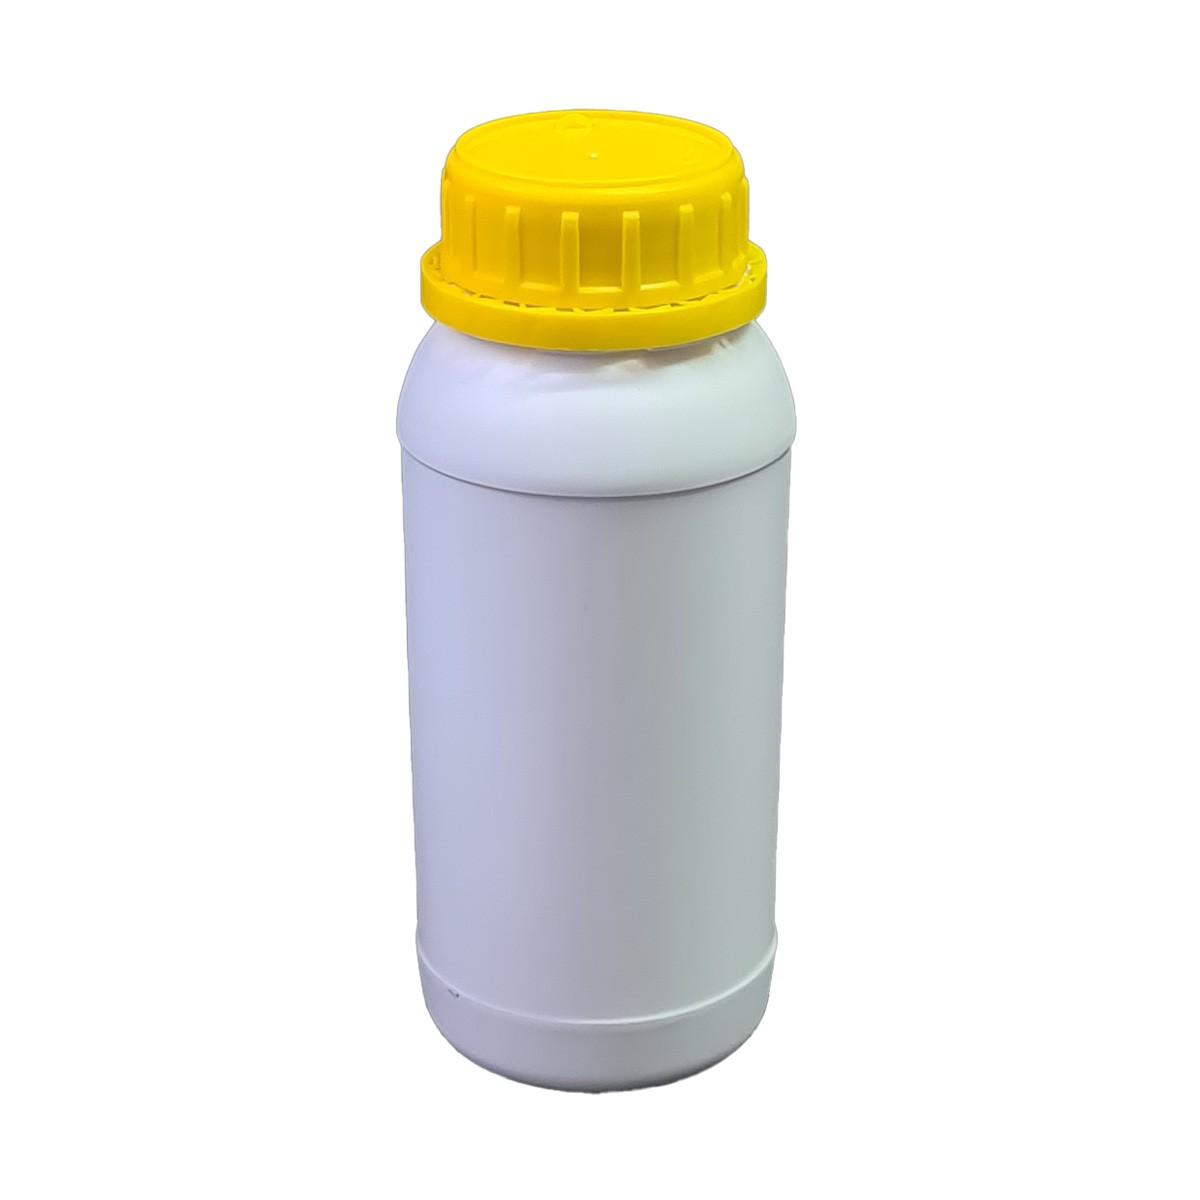 500ml meio litro de tinta Amarelo para recarga de cartuchos